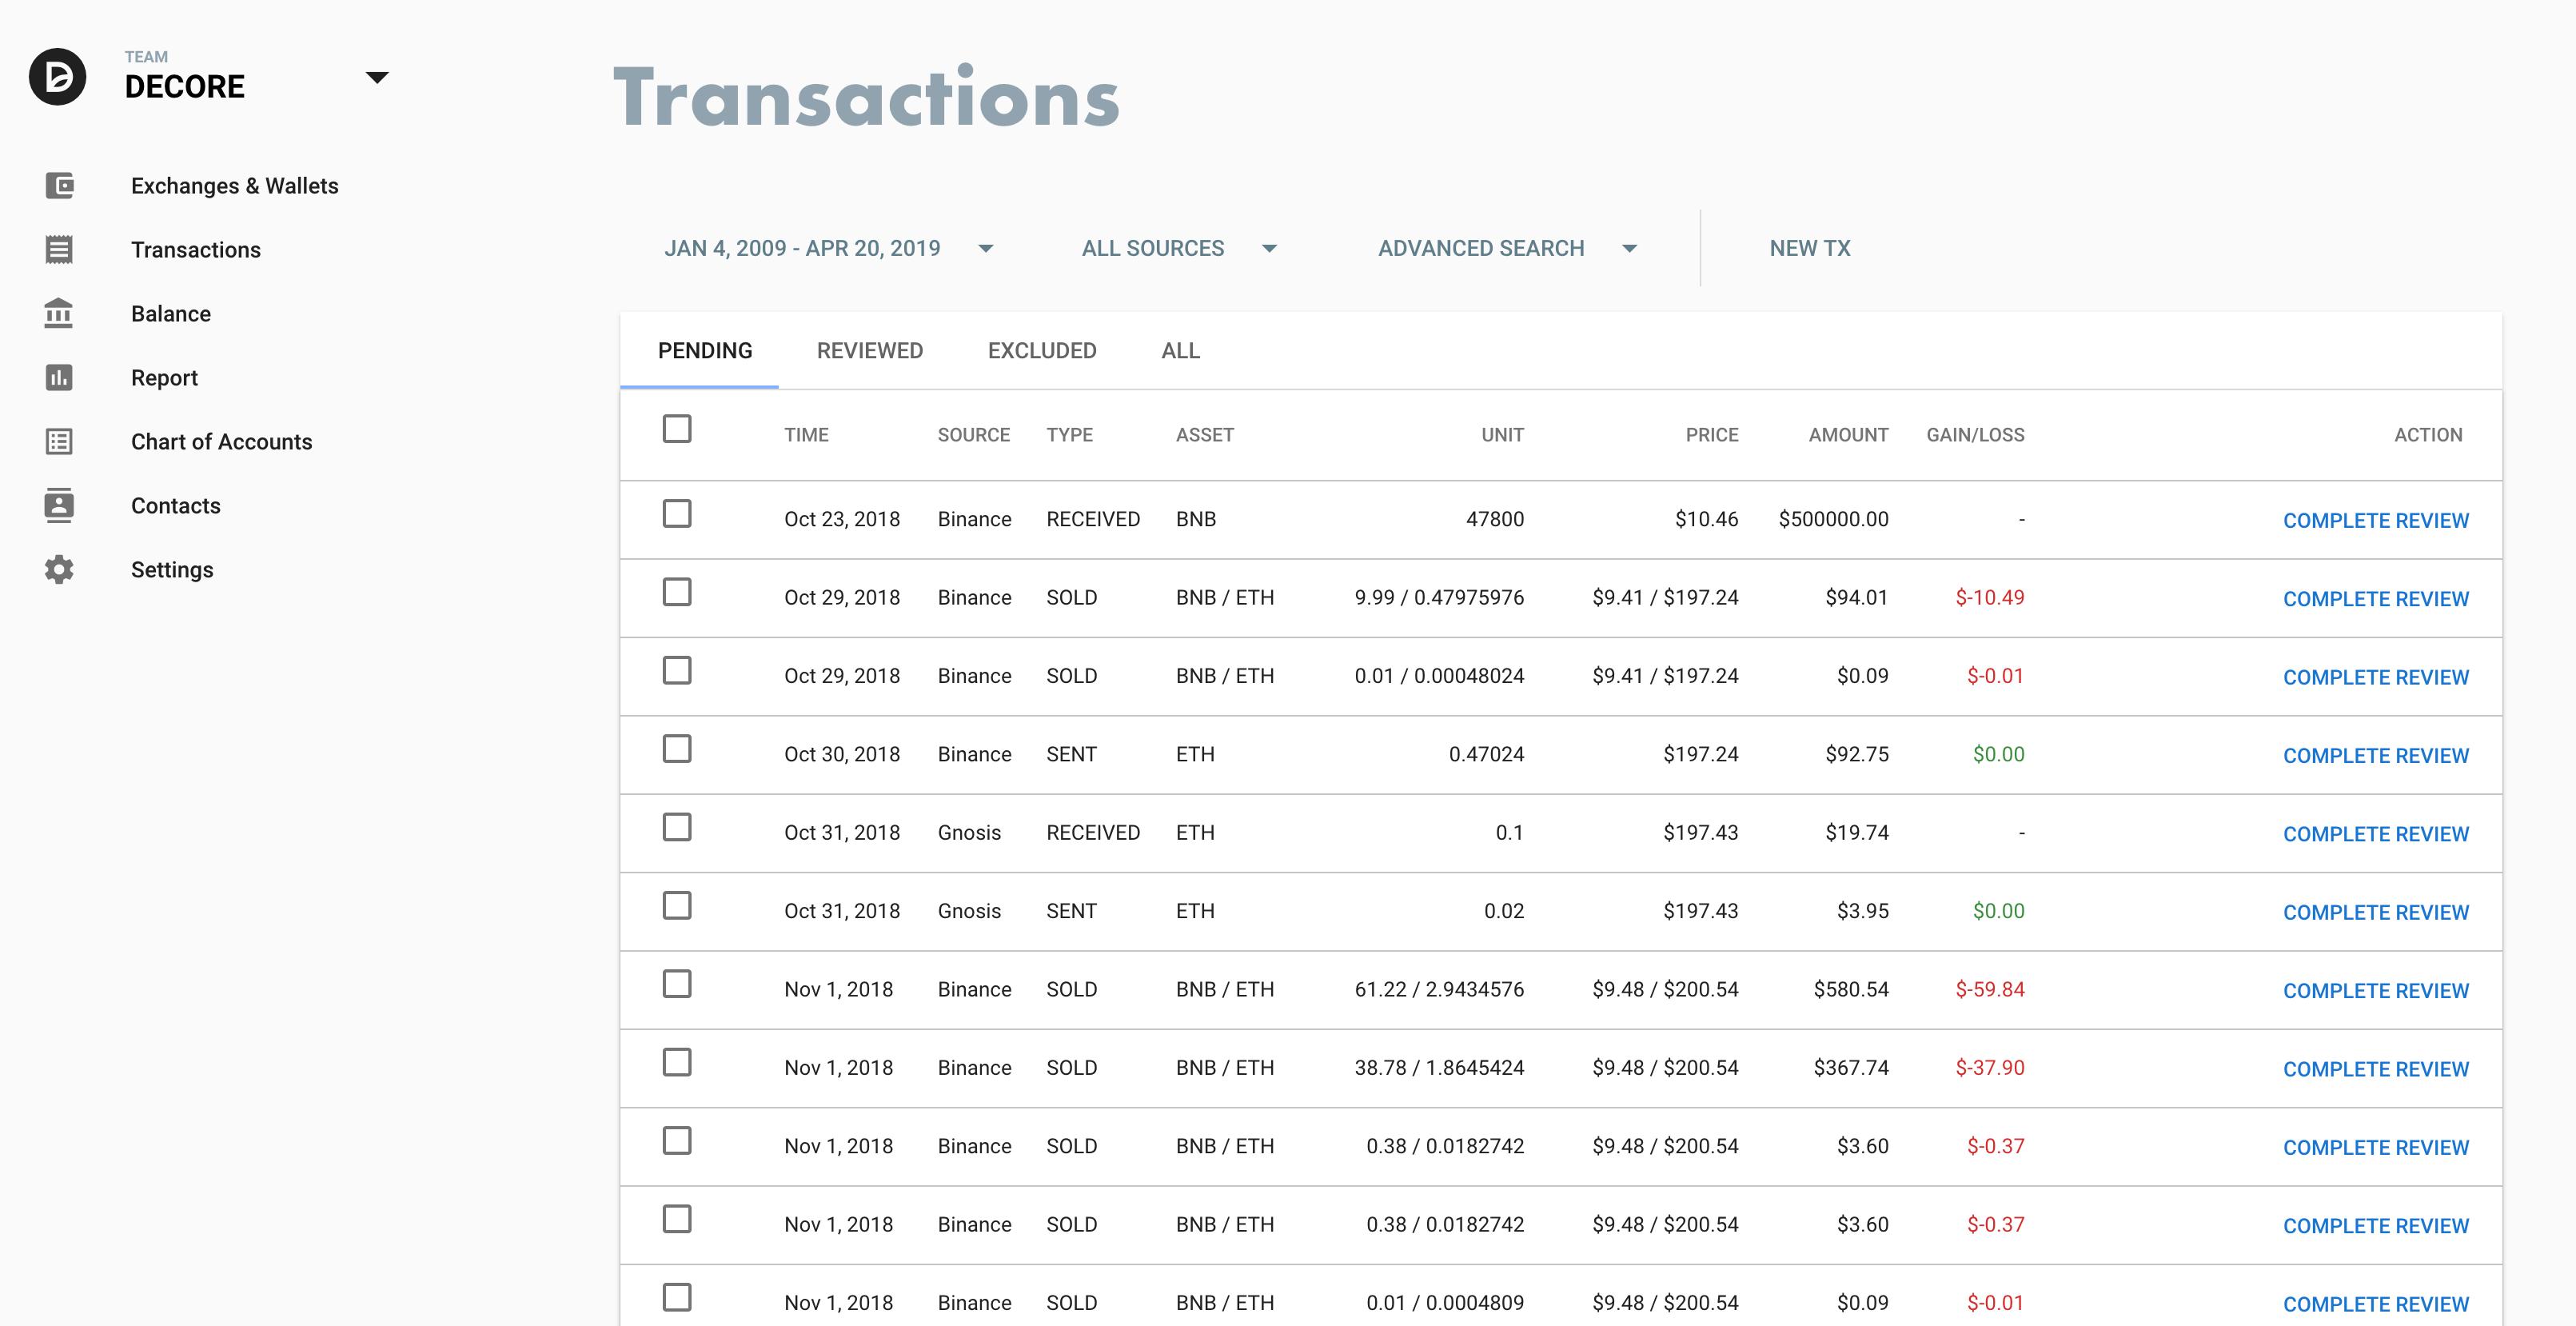 decore-transactions